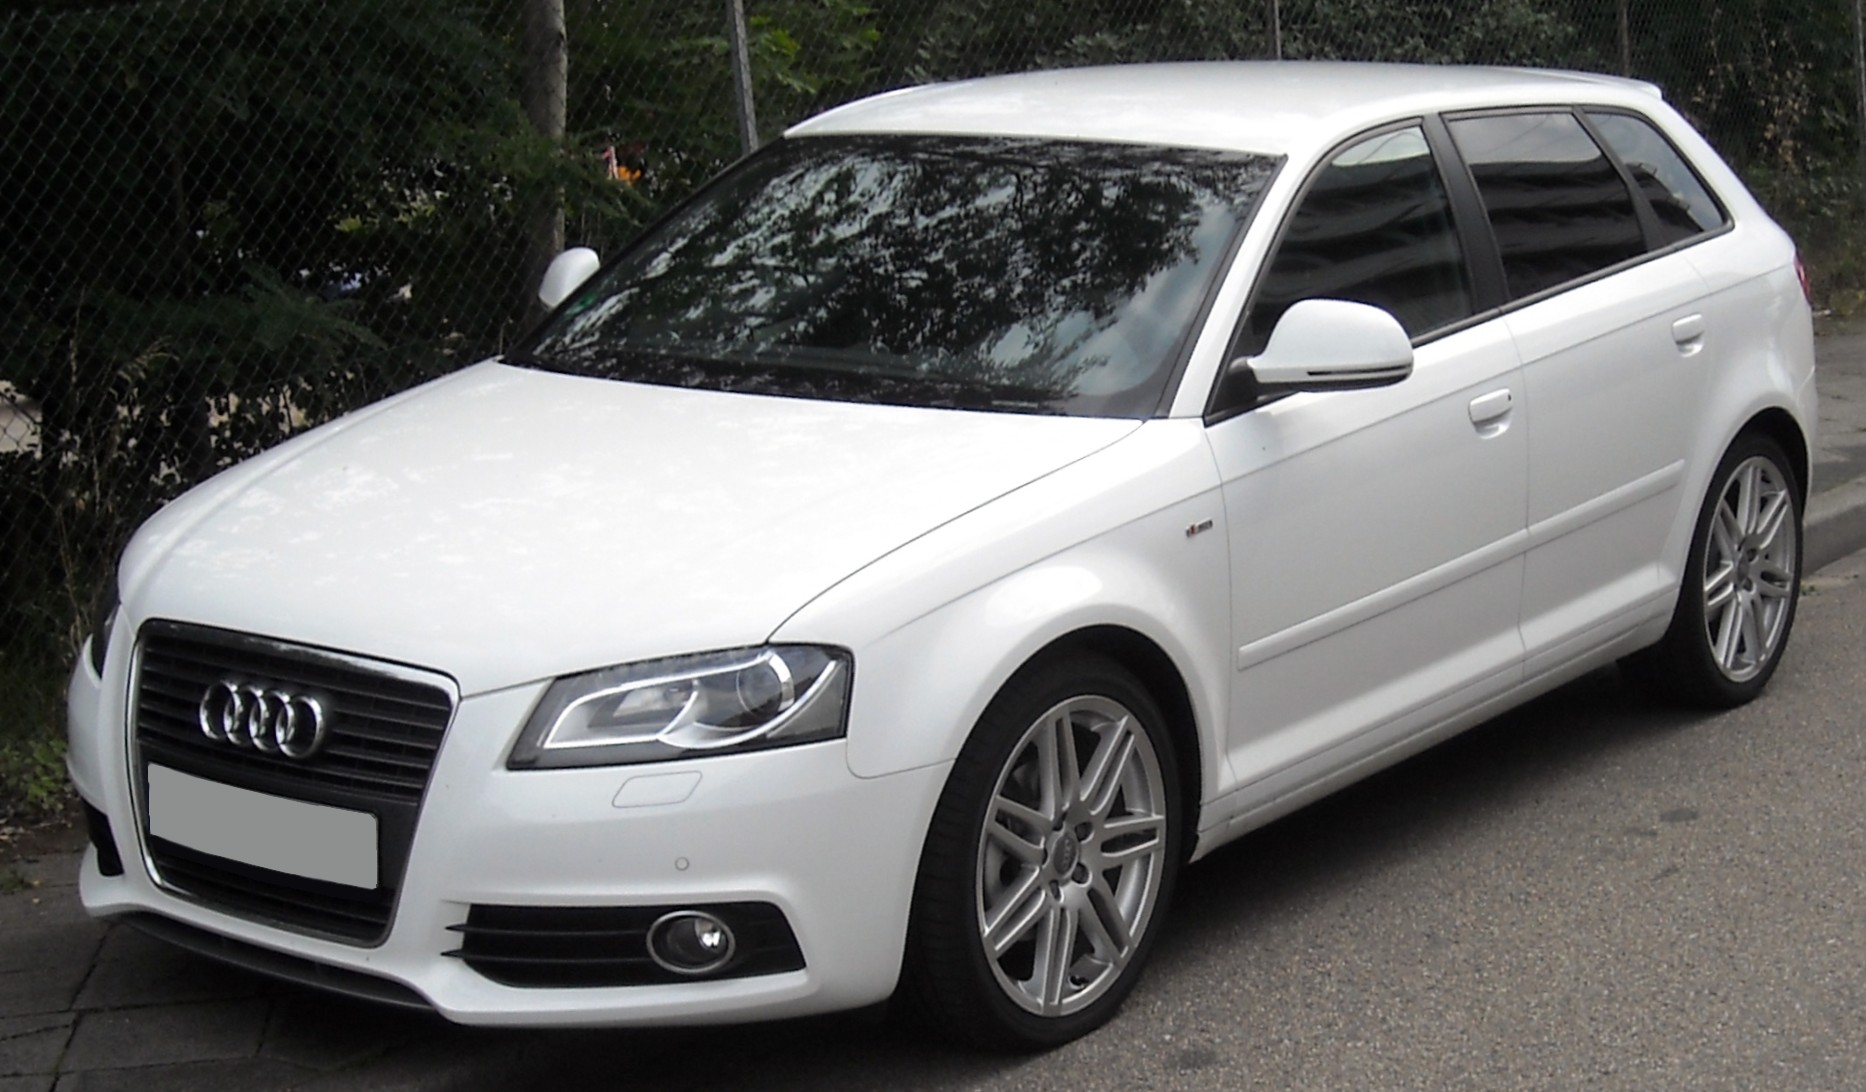 https://upload.wikimedia.org/wikipedia/commons/c/c2/Audi_A3_Sportback_front_20090714.jpg